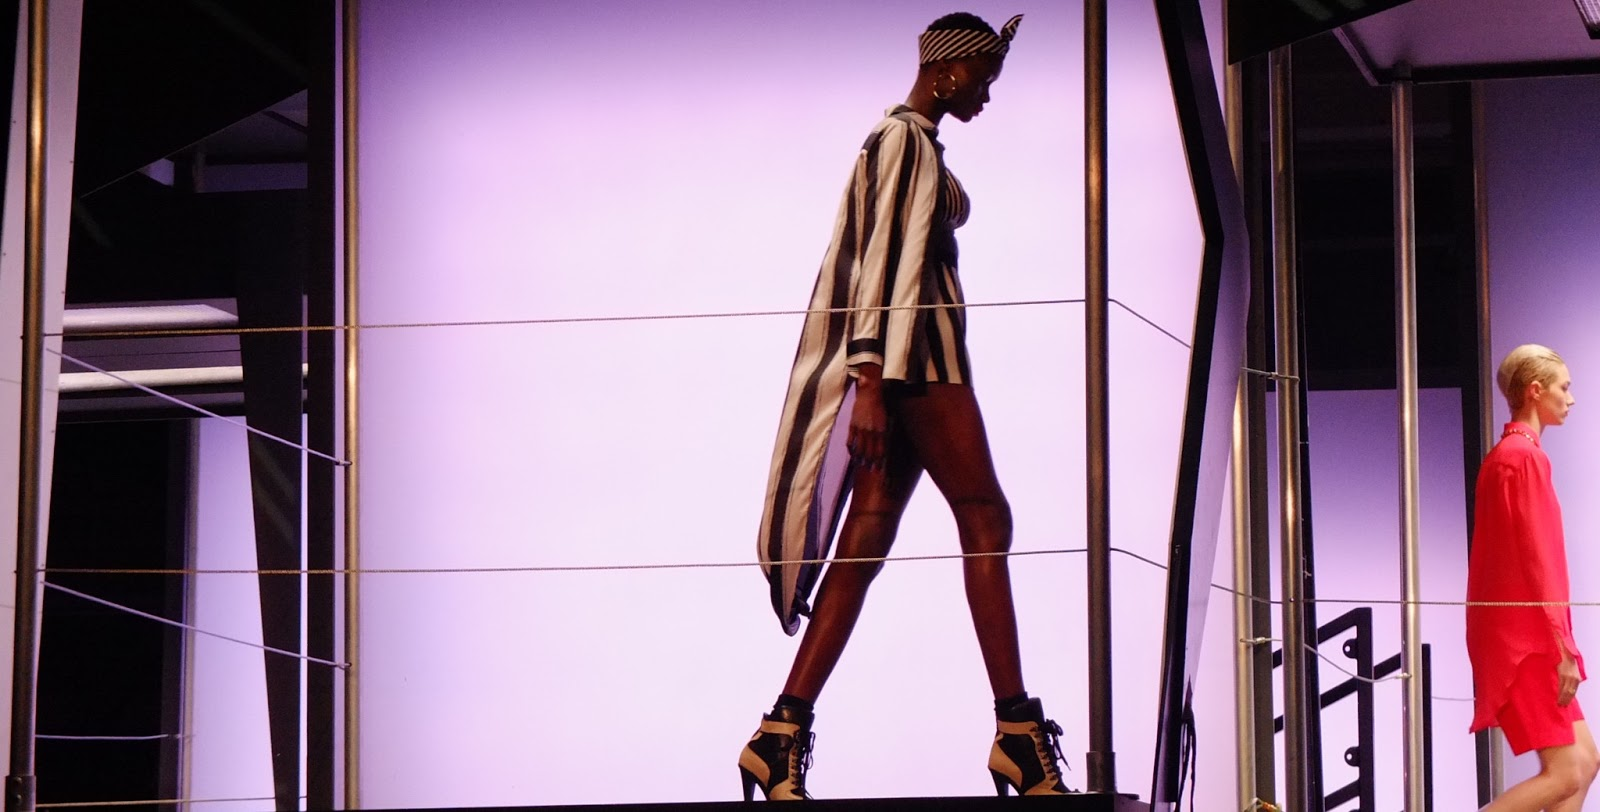 http://1.bp.blogspot.com/-N7E-ZAScBVg/USilTiG2zwI/AAAAAAAAAXo/JbqOvxRYw3U/s1600/Rihanna-river-island-fashion-show5.jpg